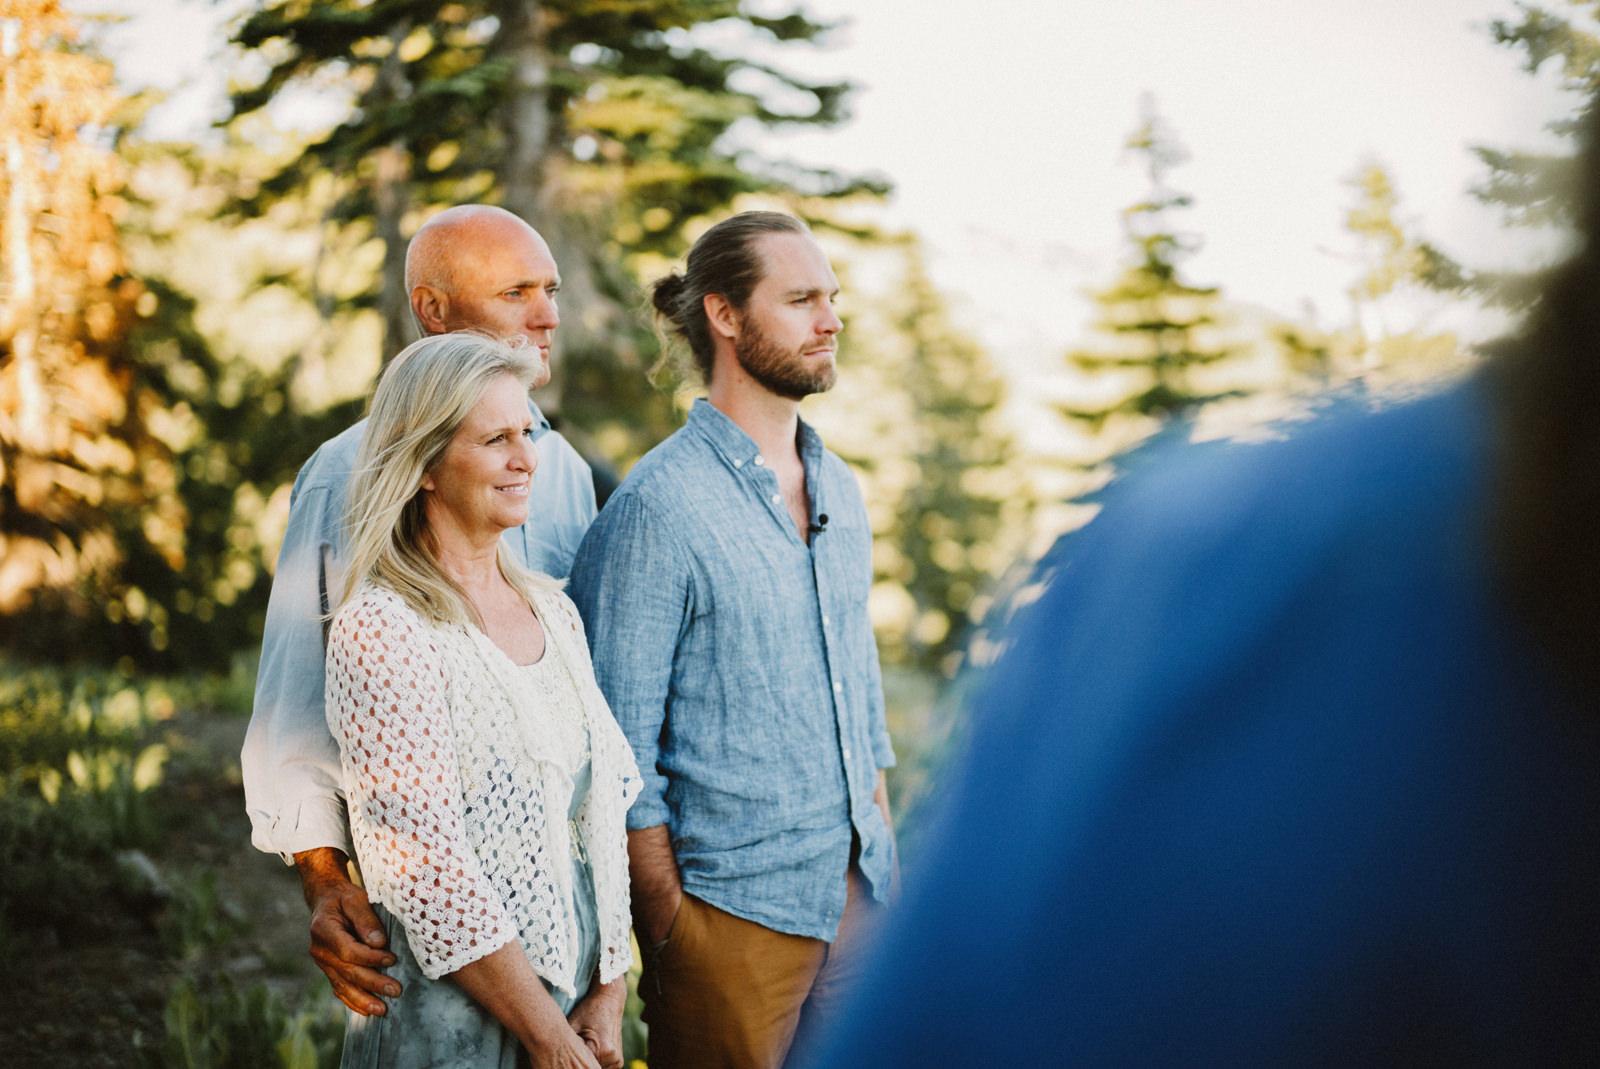 lake-tahoe-elopement-059 LAKE TAHOE ELOPEMENT